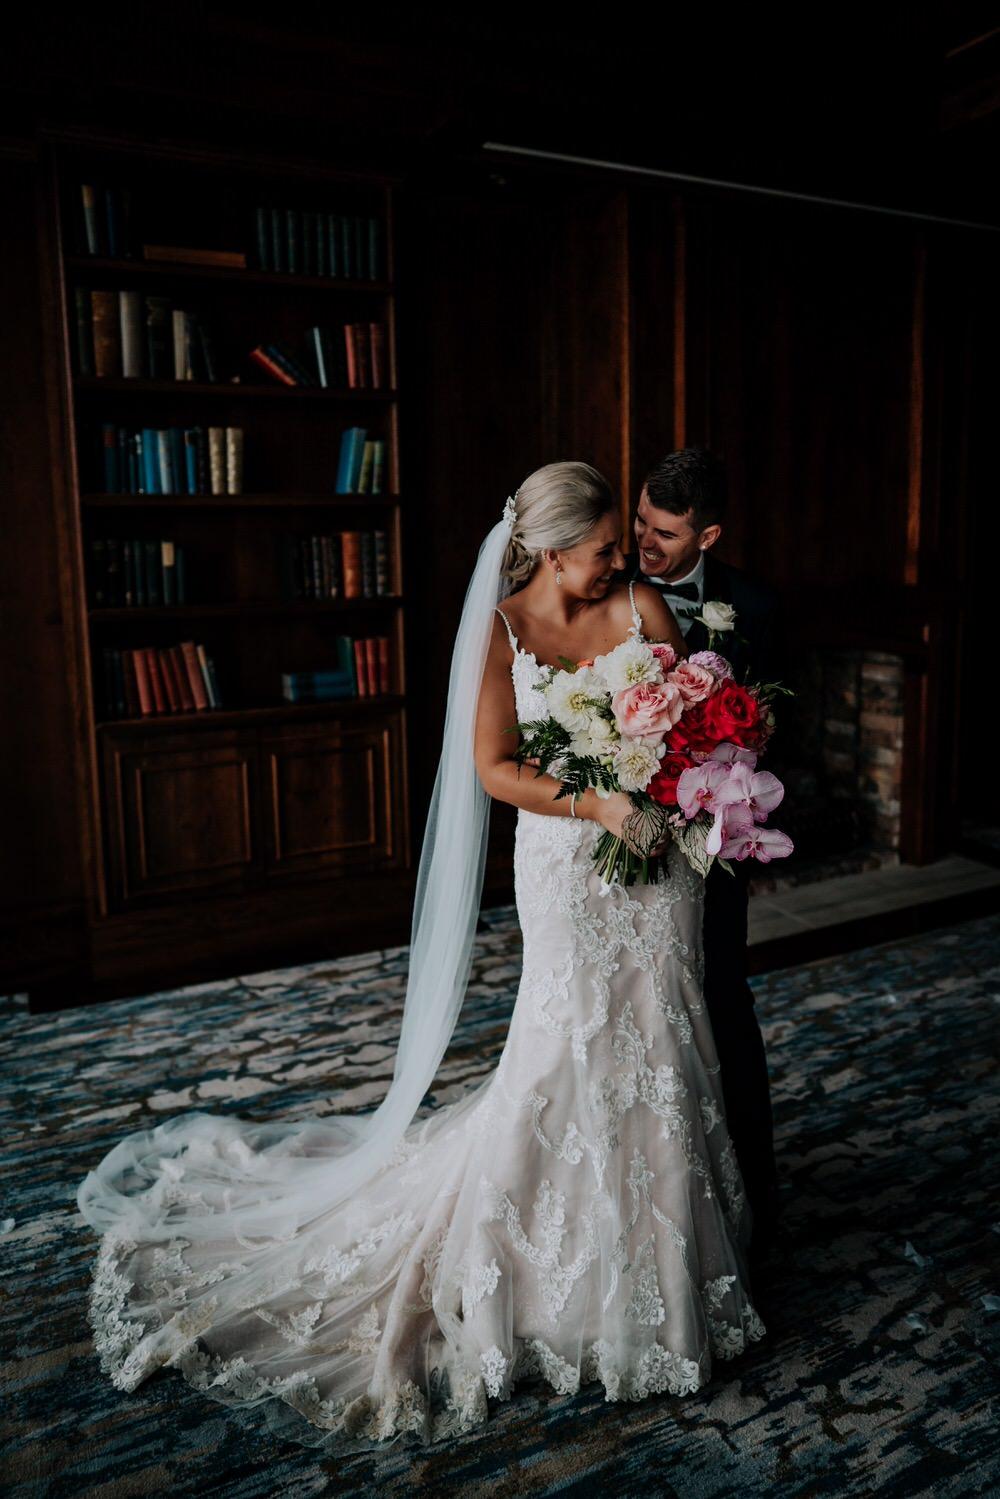 ava-me-photography-gemma-brent-zest-point-piper-sydney-wedding-491